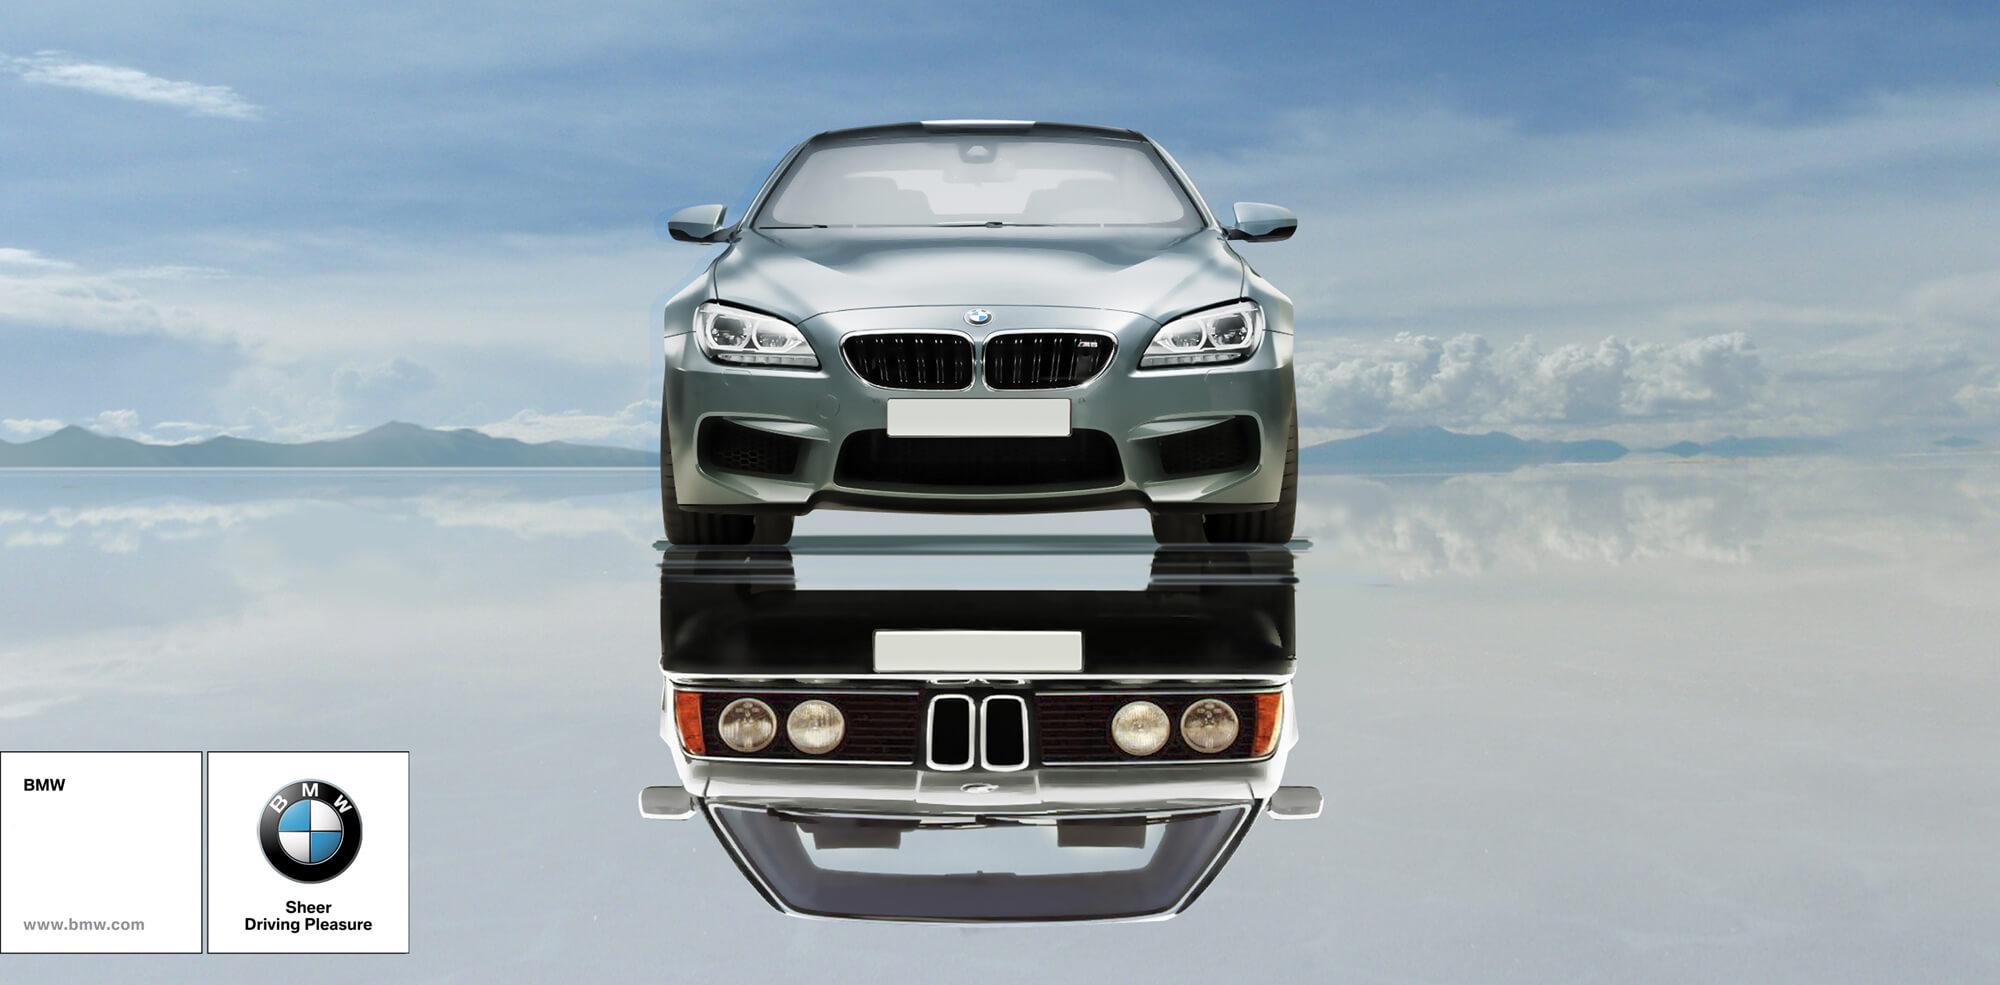 BMW_Print_Ads_1.jpg